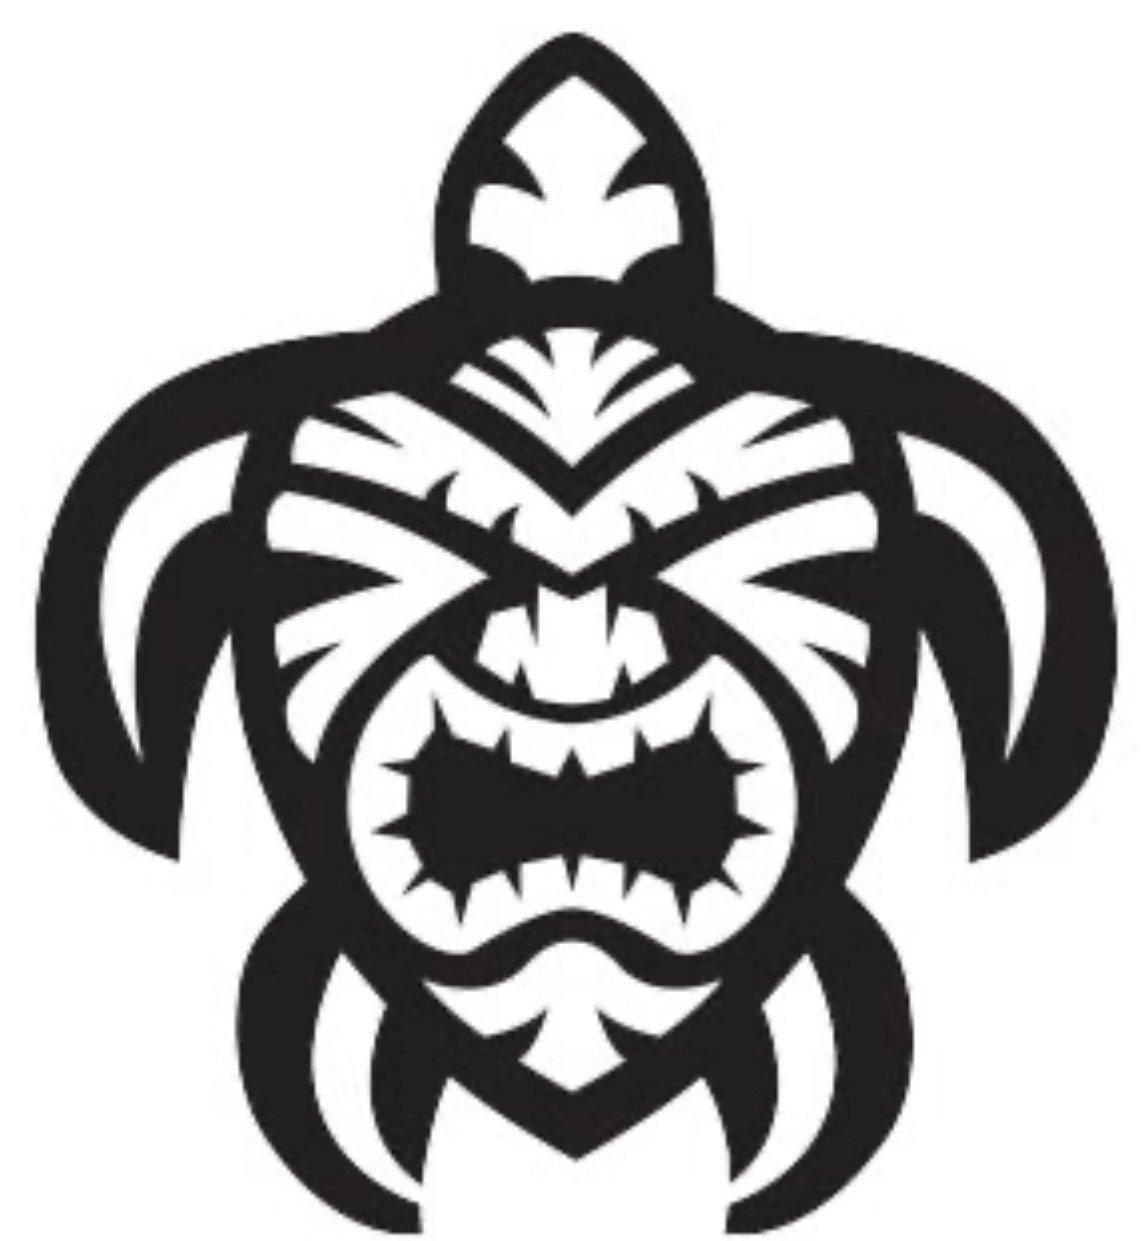 Image of Tiki Turtle Vinyl sticker.